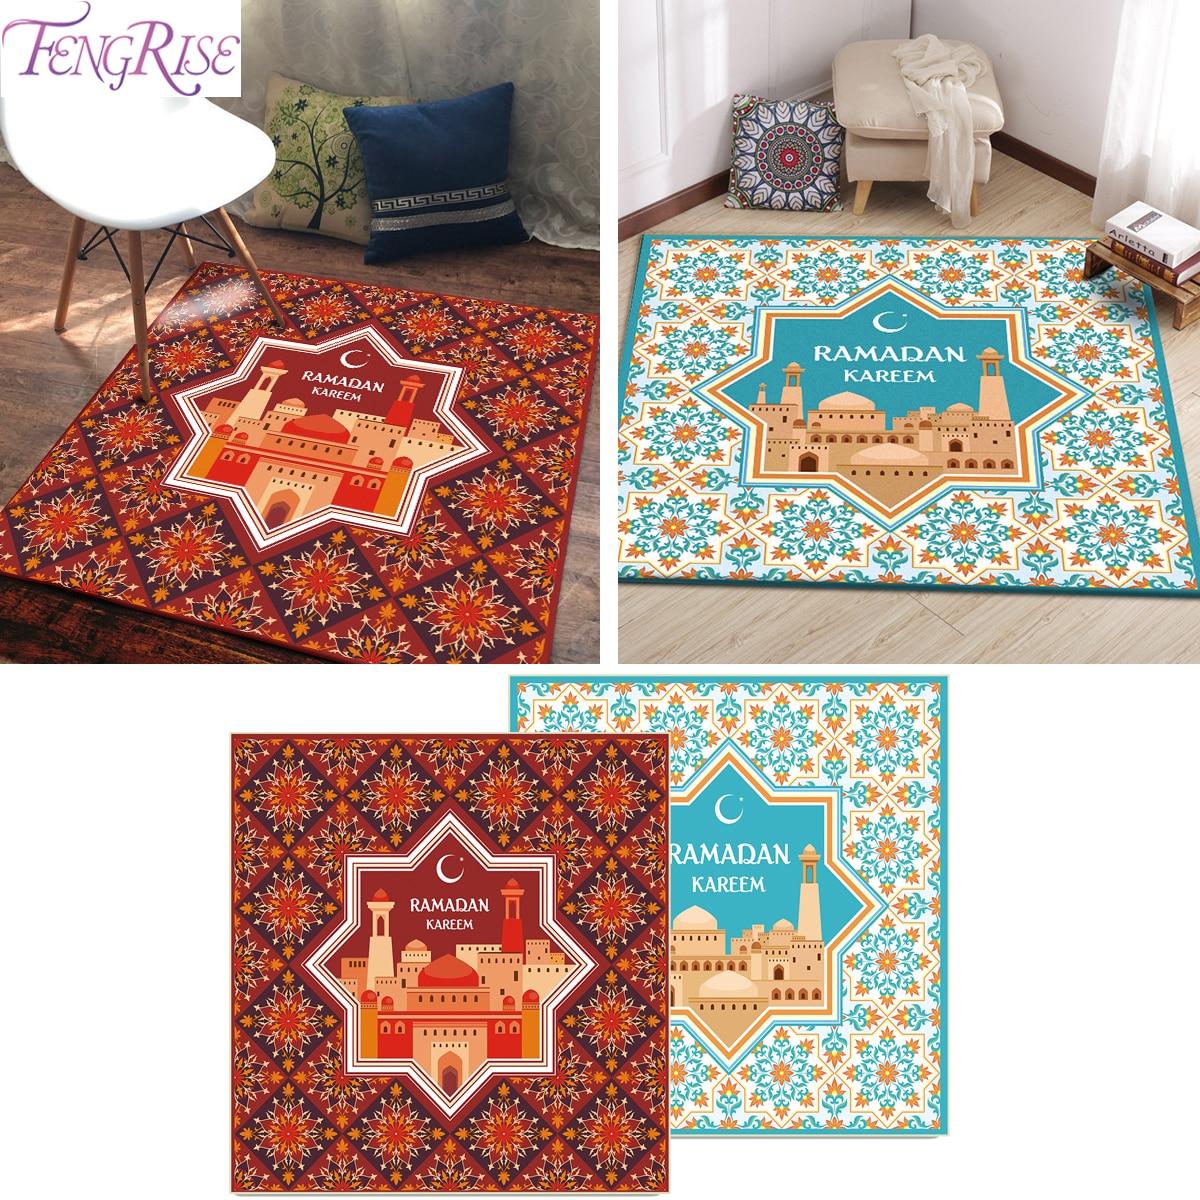 Rugs Pattern Carpets Ramadan Decoration Ramadan Kareem Islamic Muslim Ramadan Decorations For Home Aid Eid Mubarak Decor Room